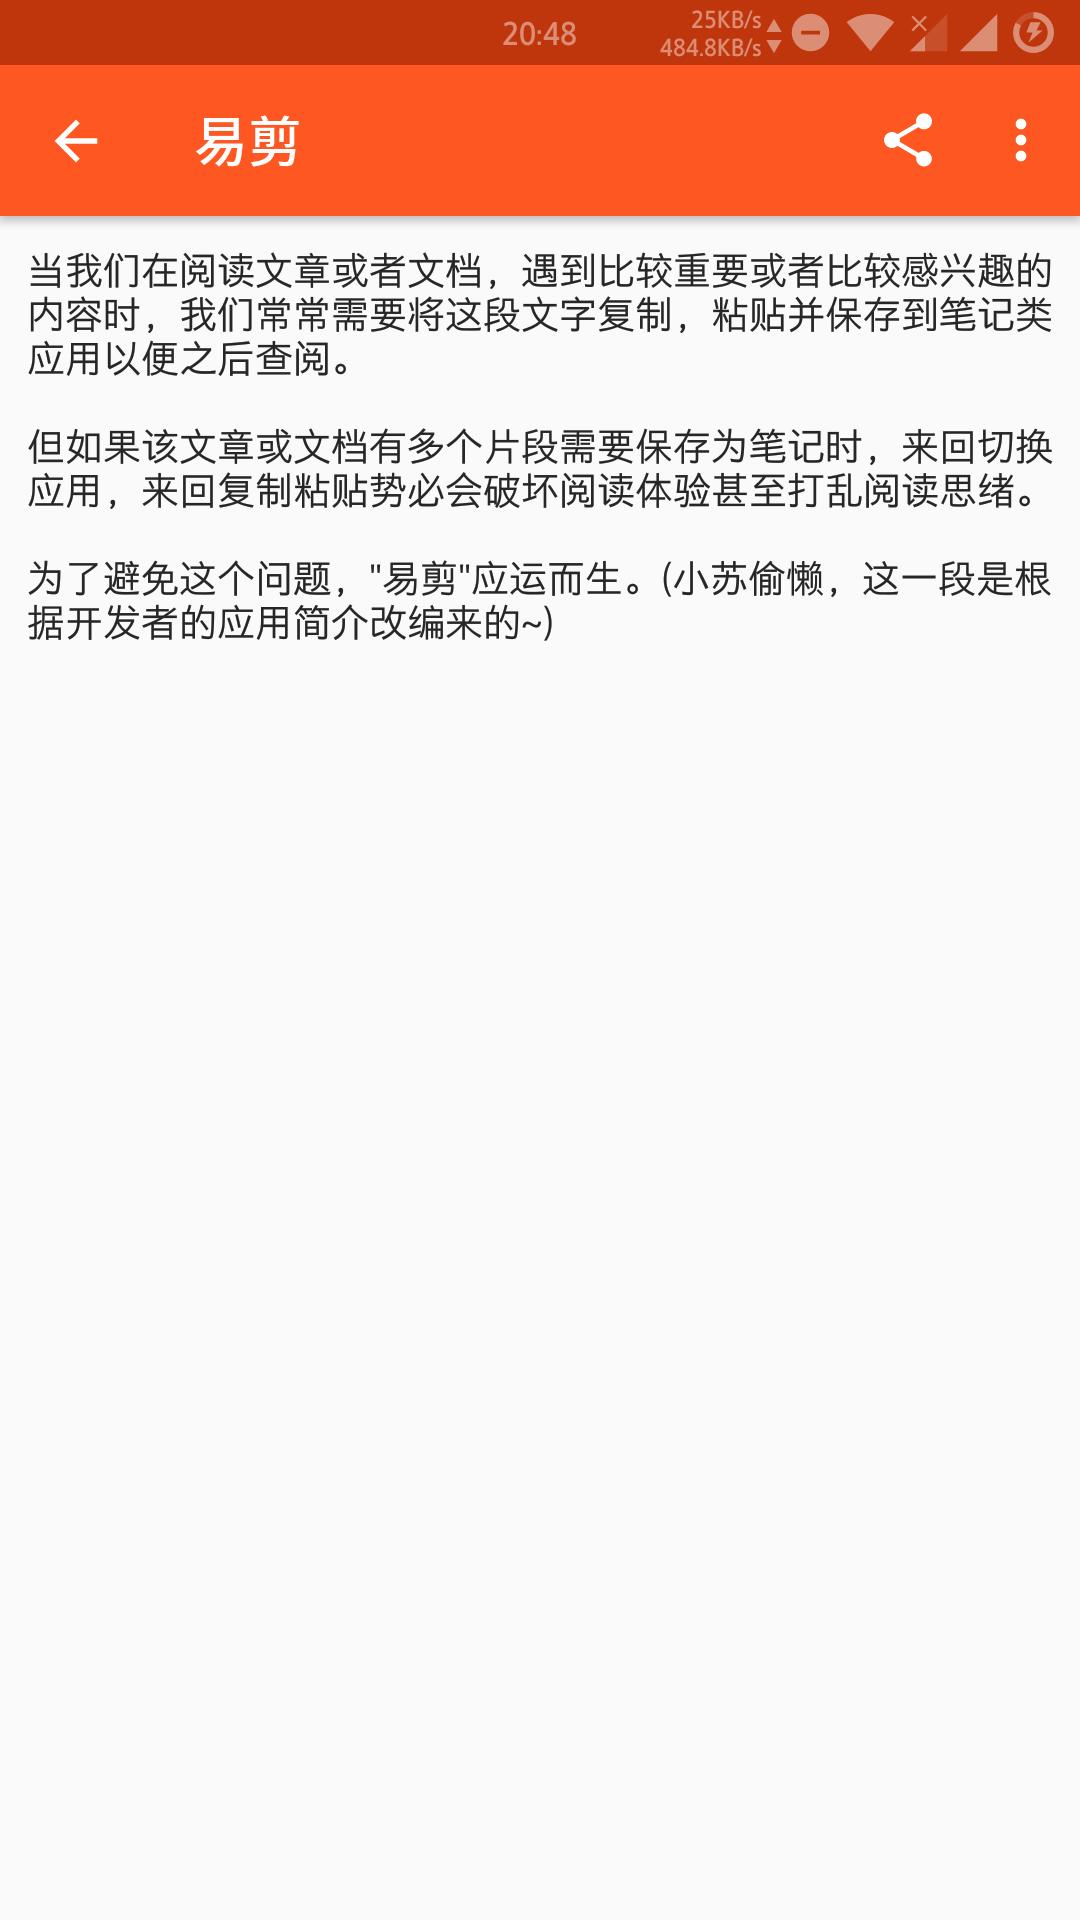 Screenshot_20170315-204853.png